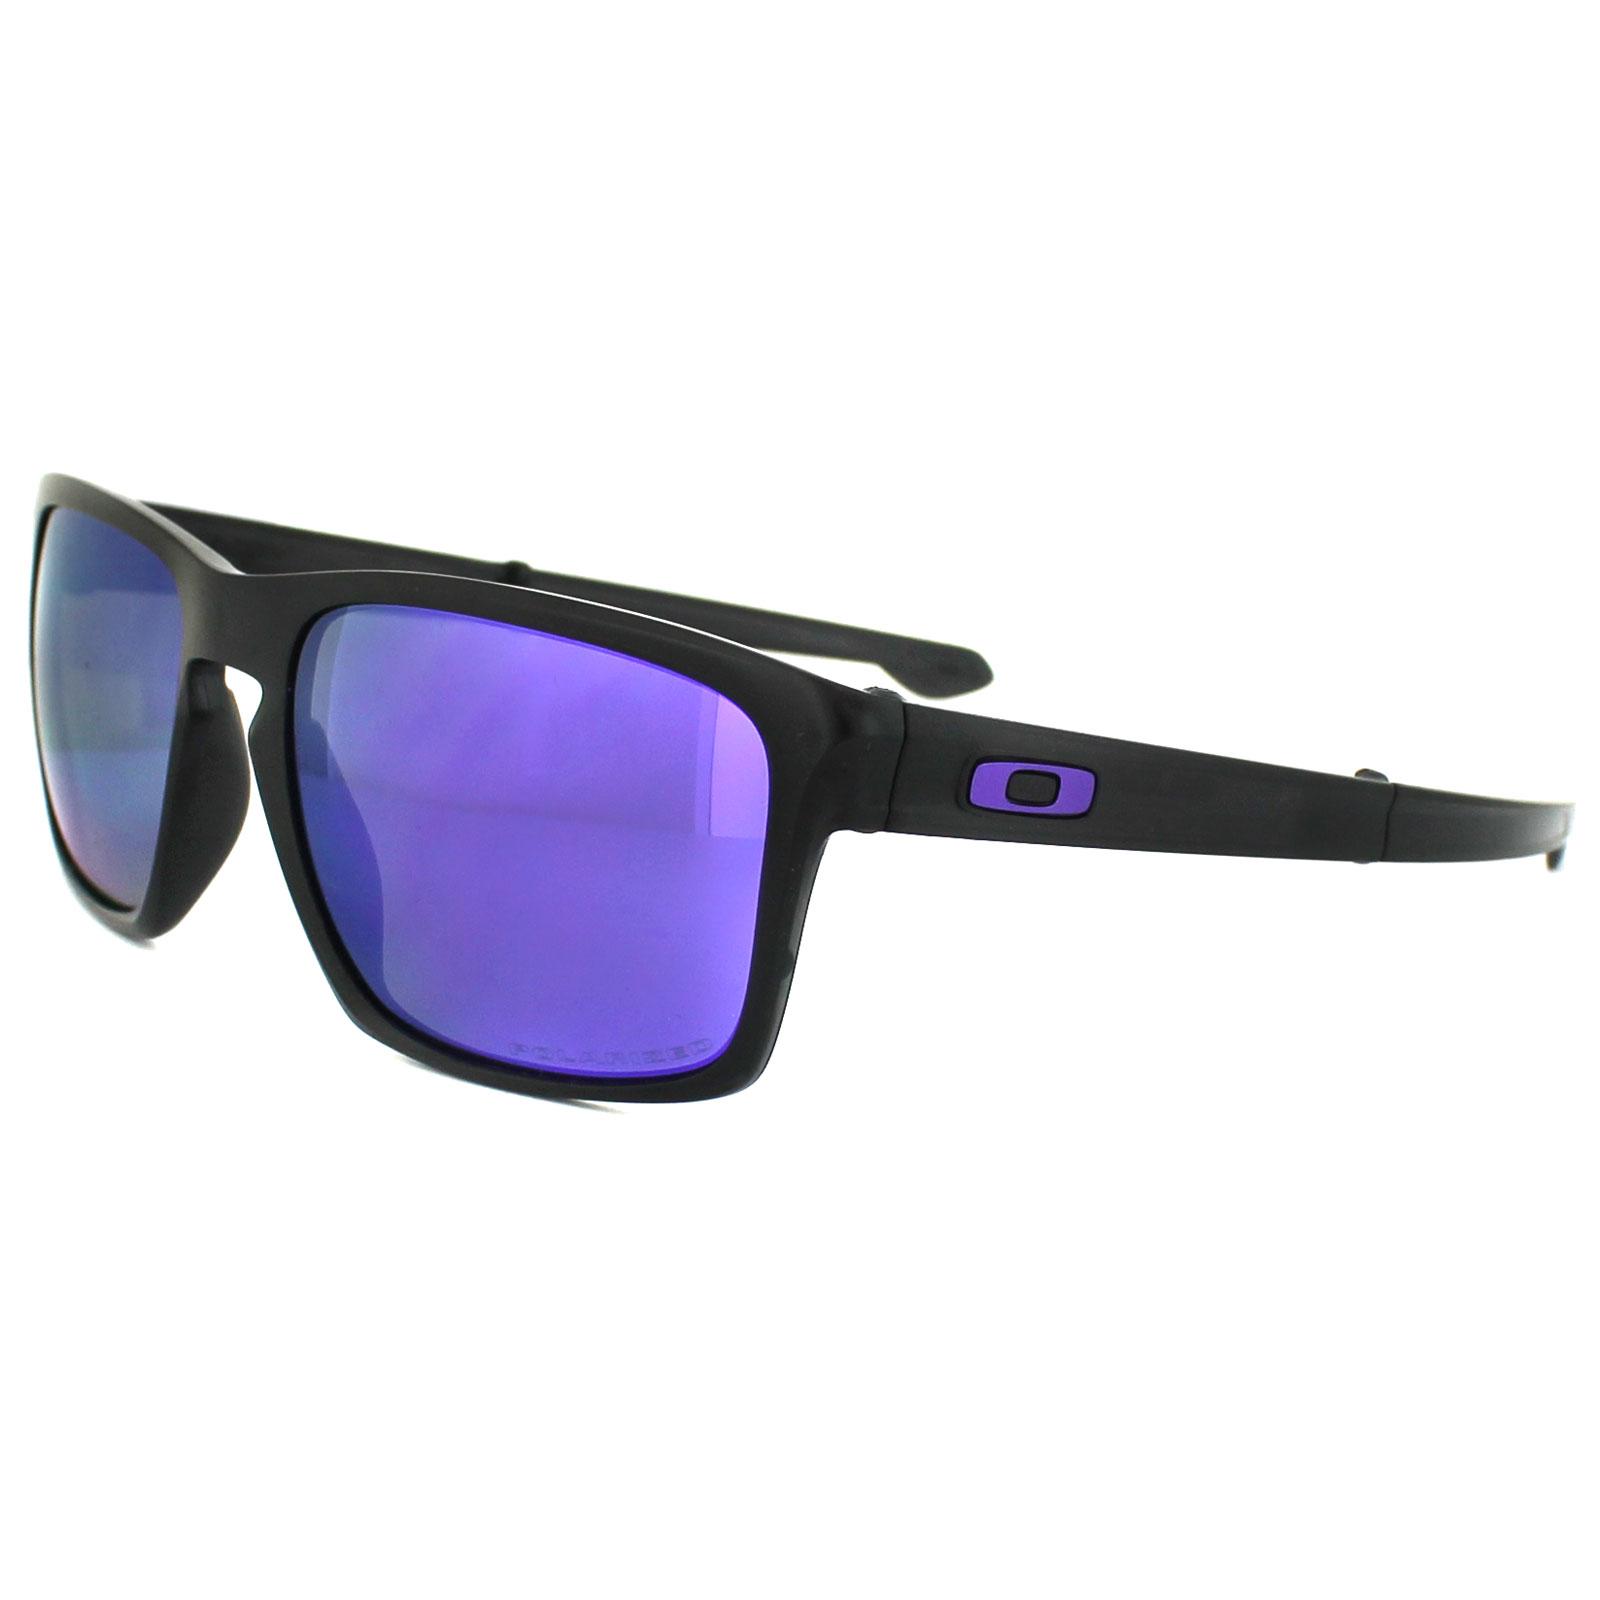 oakley shades price  Oakley Sunglasses Sliver F OO9246-07 Matt Black Violet Iridium ...